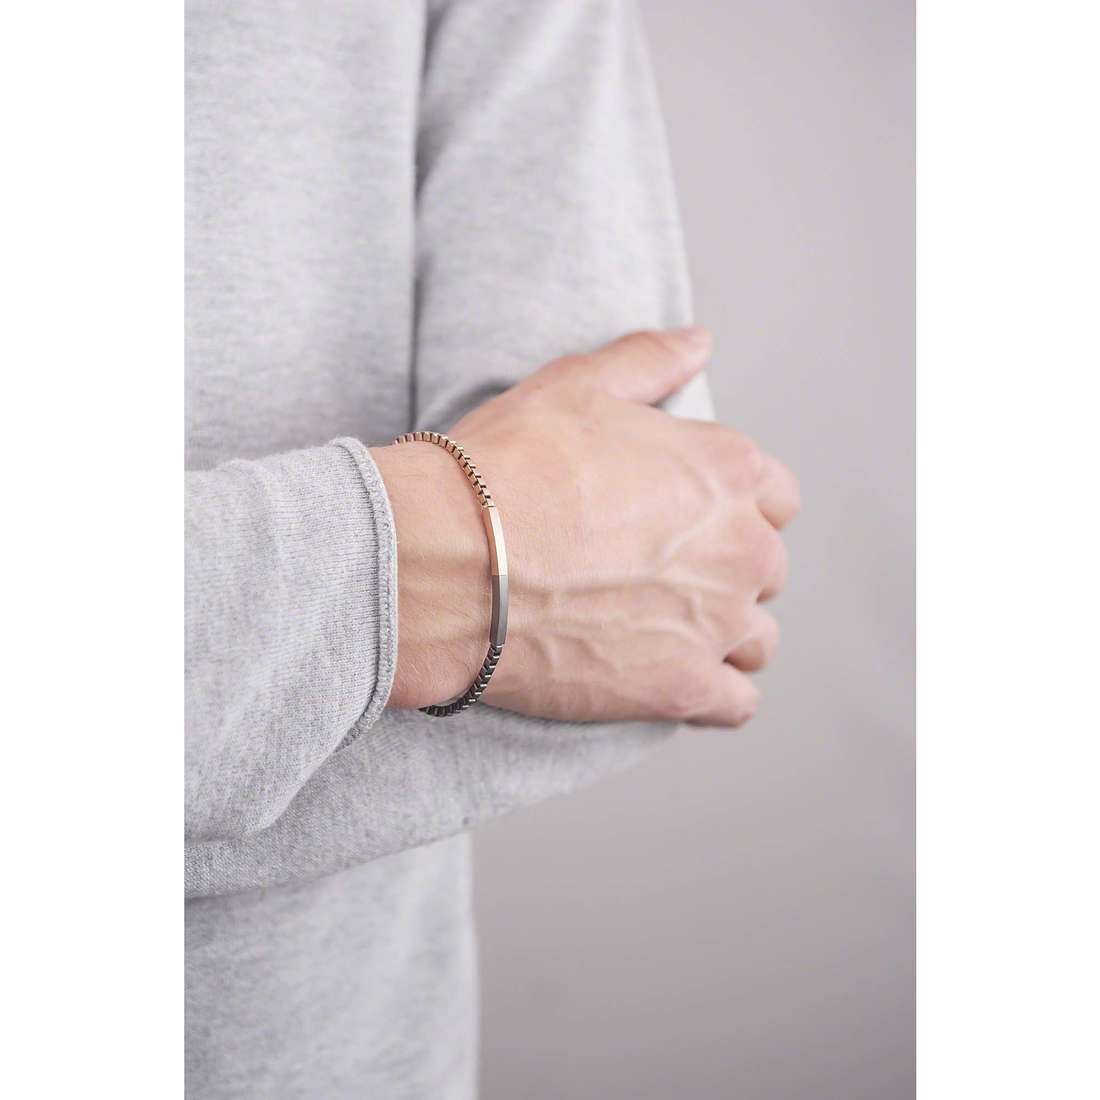 Emporio Armani bracciali Spring uomo EGS2125221 indosso